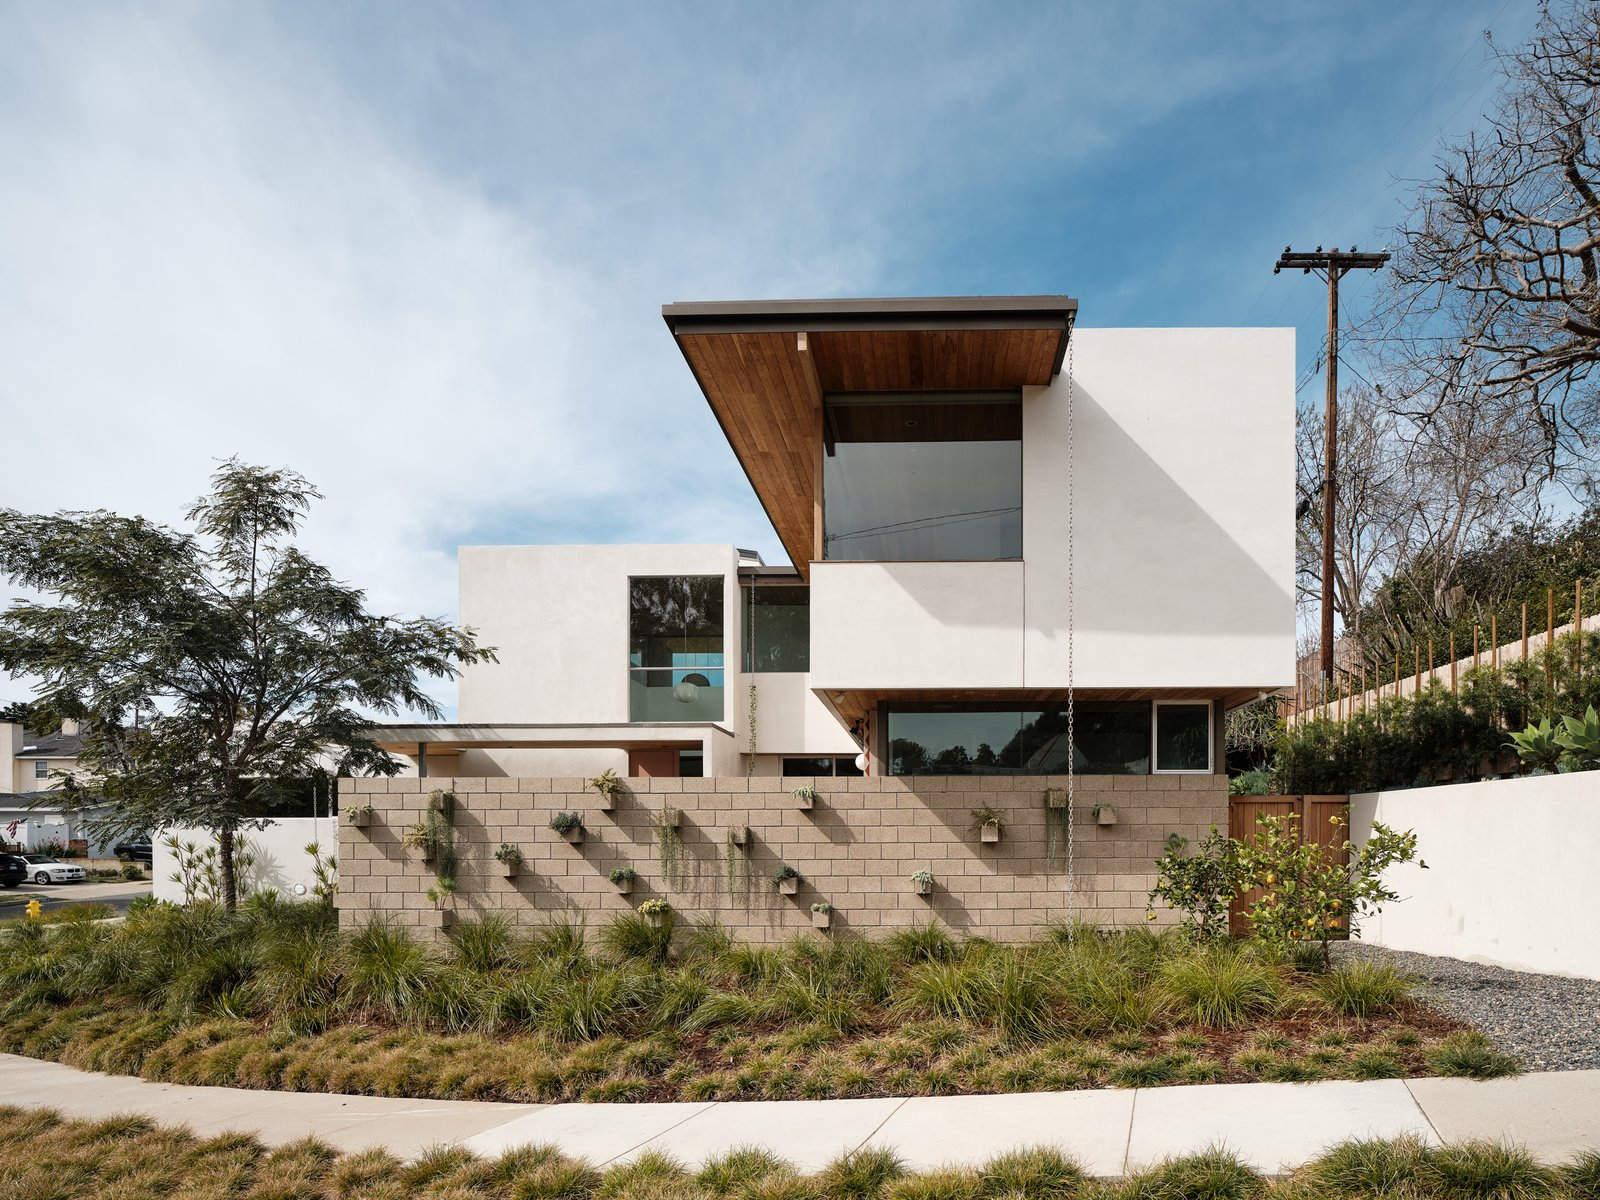 Courtyard House by Ras-a Studio exterior